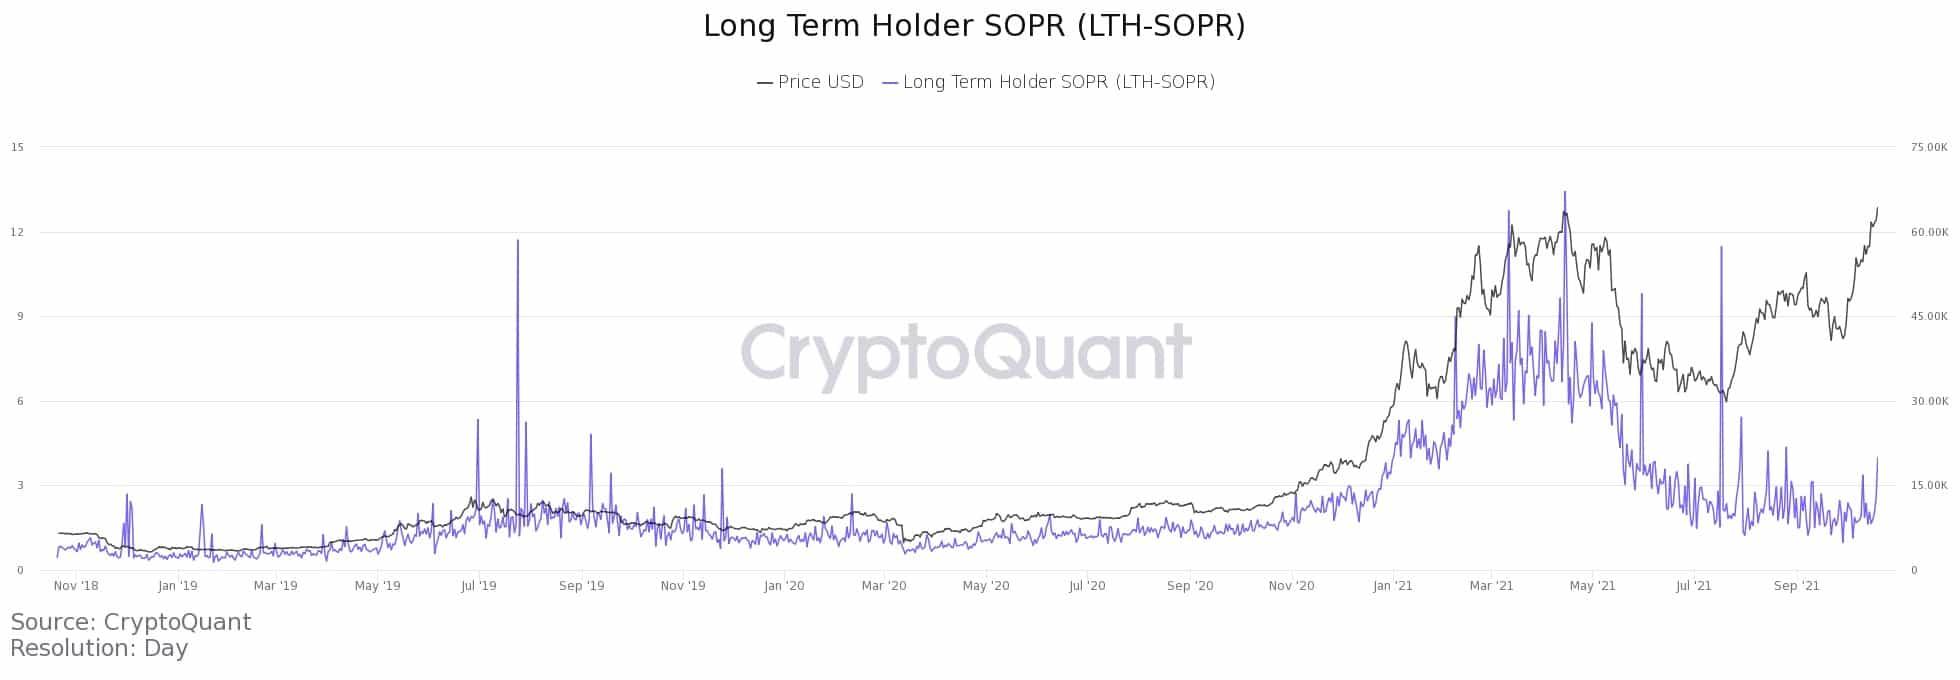 long-term-holder-sopr-lt-oct20